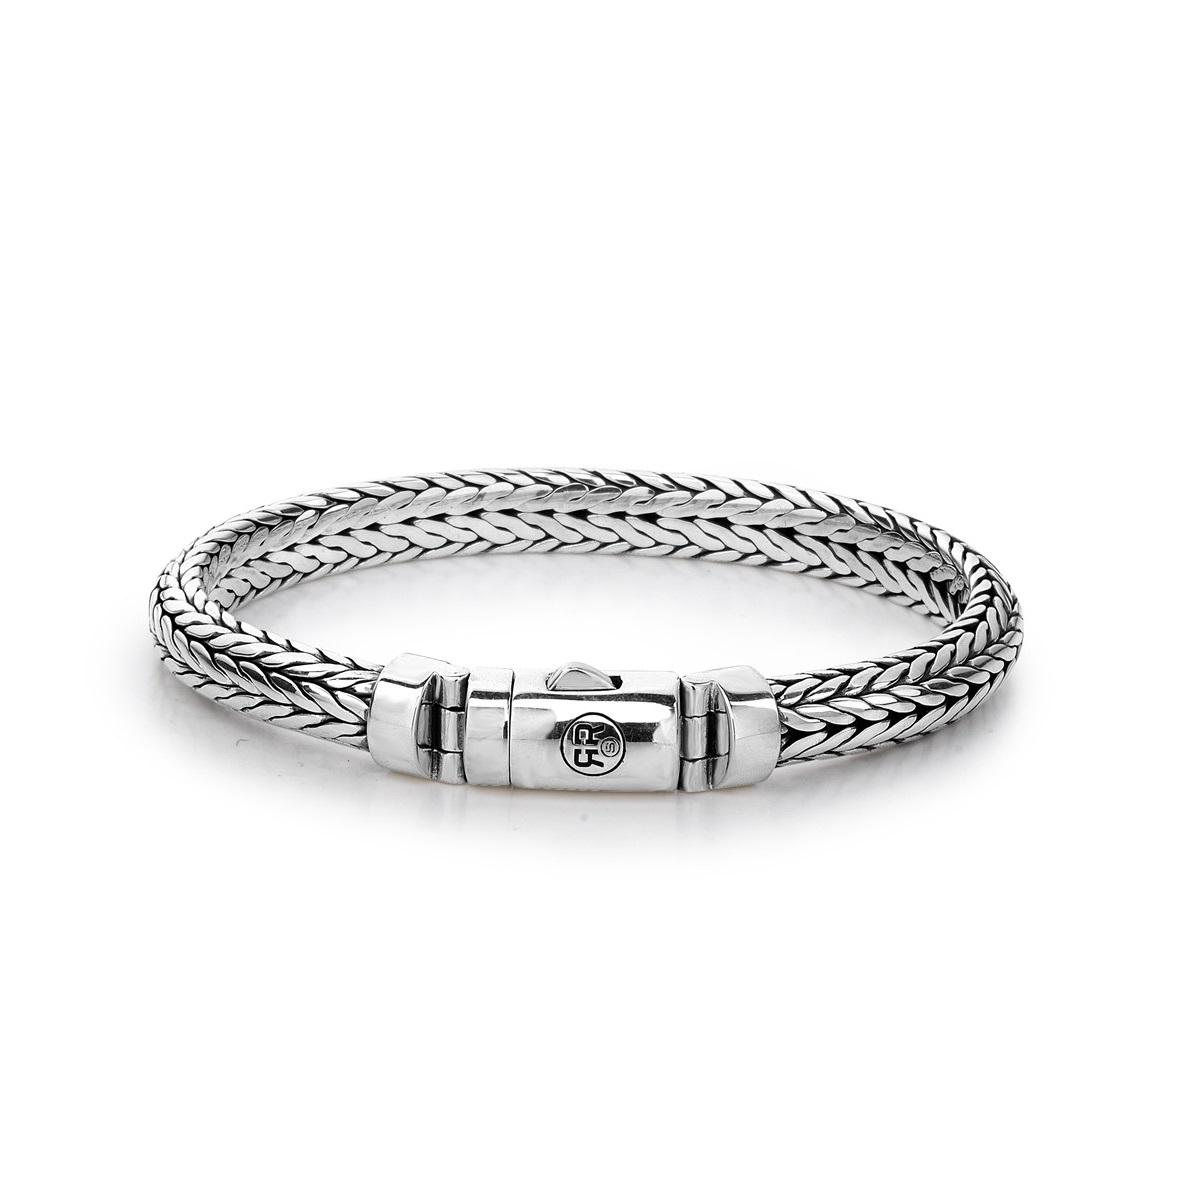 Rebel & Rose IRIS Silver Bracelet XL